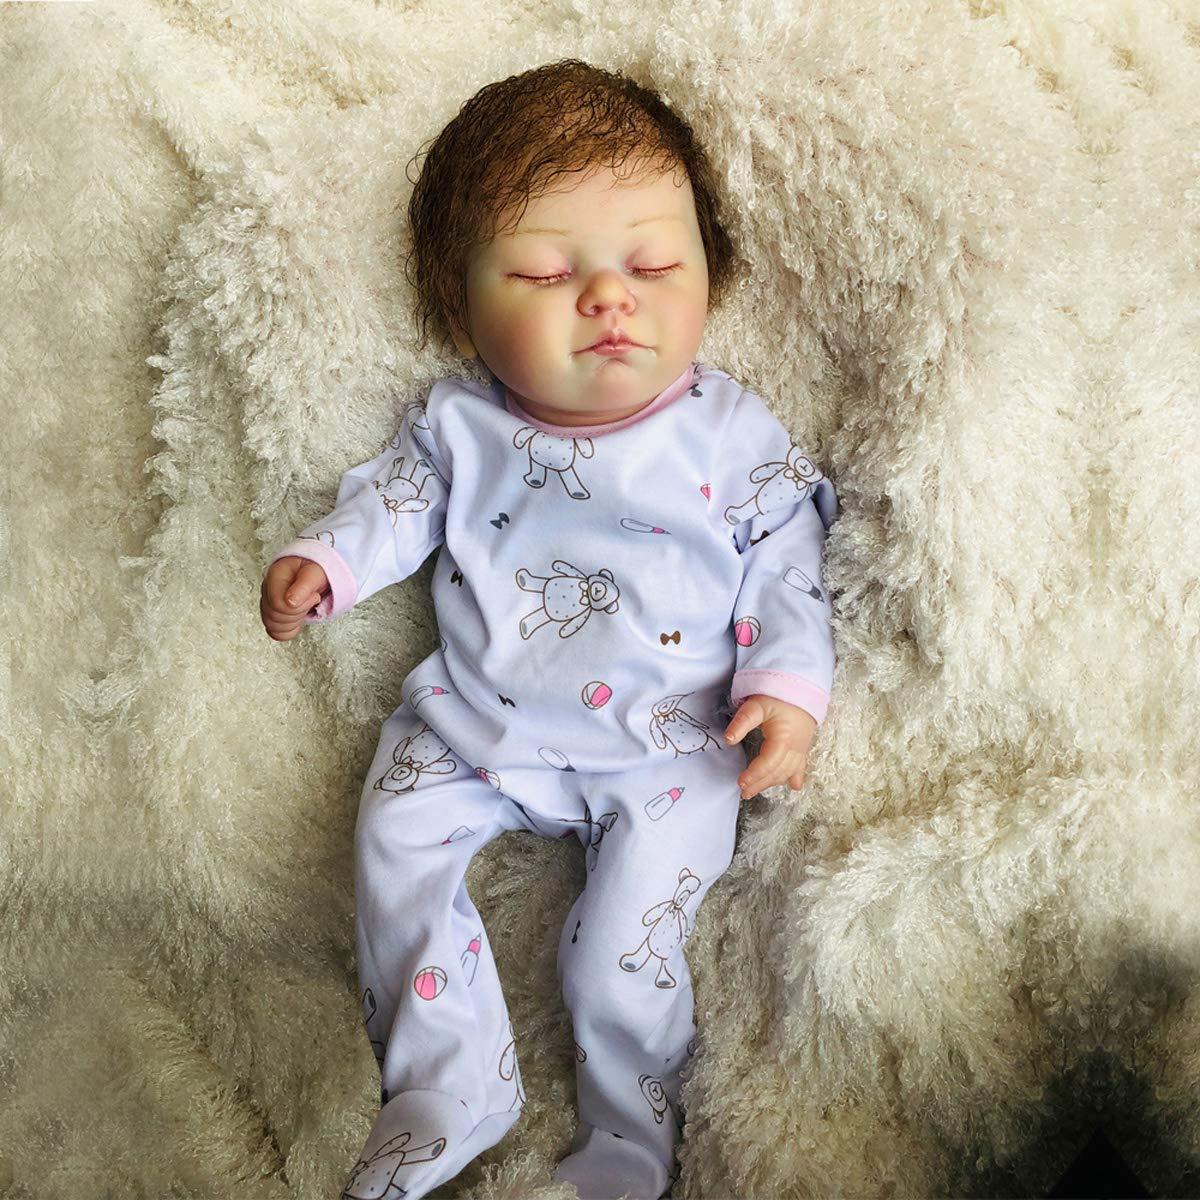 TERABITHIA 20 Zoll Rare Alive wasserdichte schlafende Silikon Reborn Babypuppen